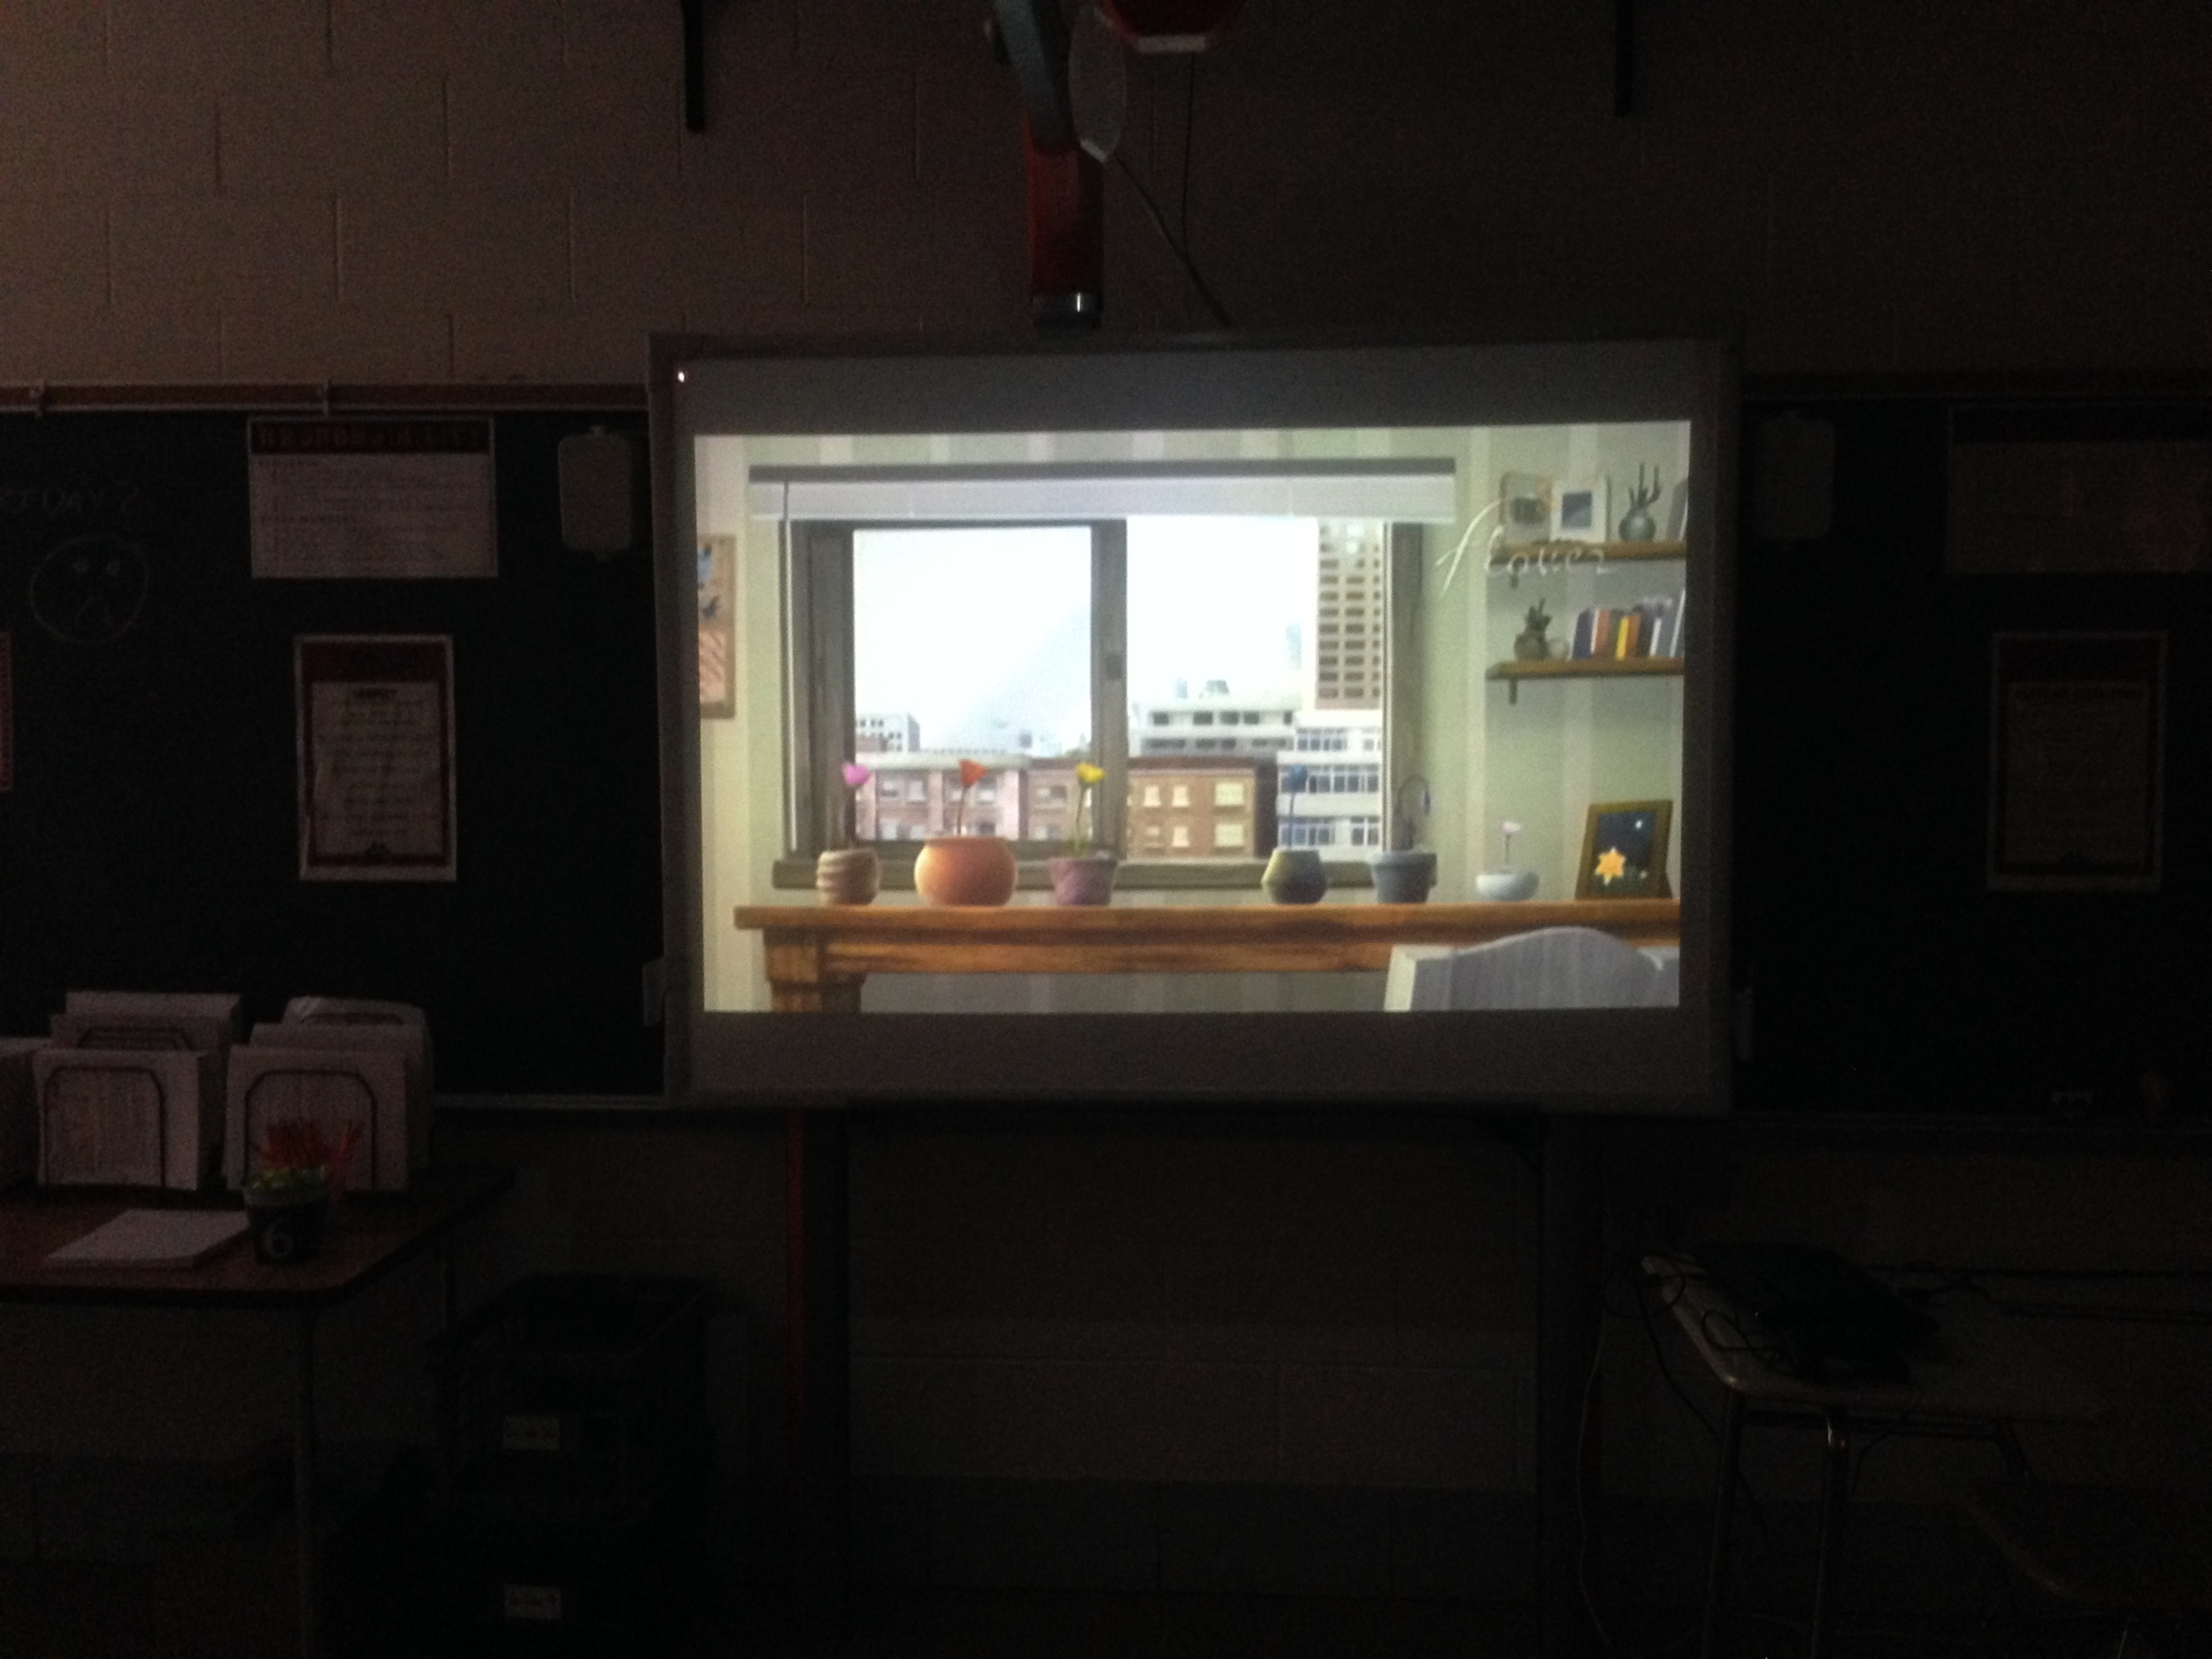 Alternative Setup: Whole class plays together.